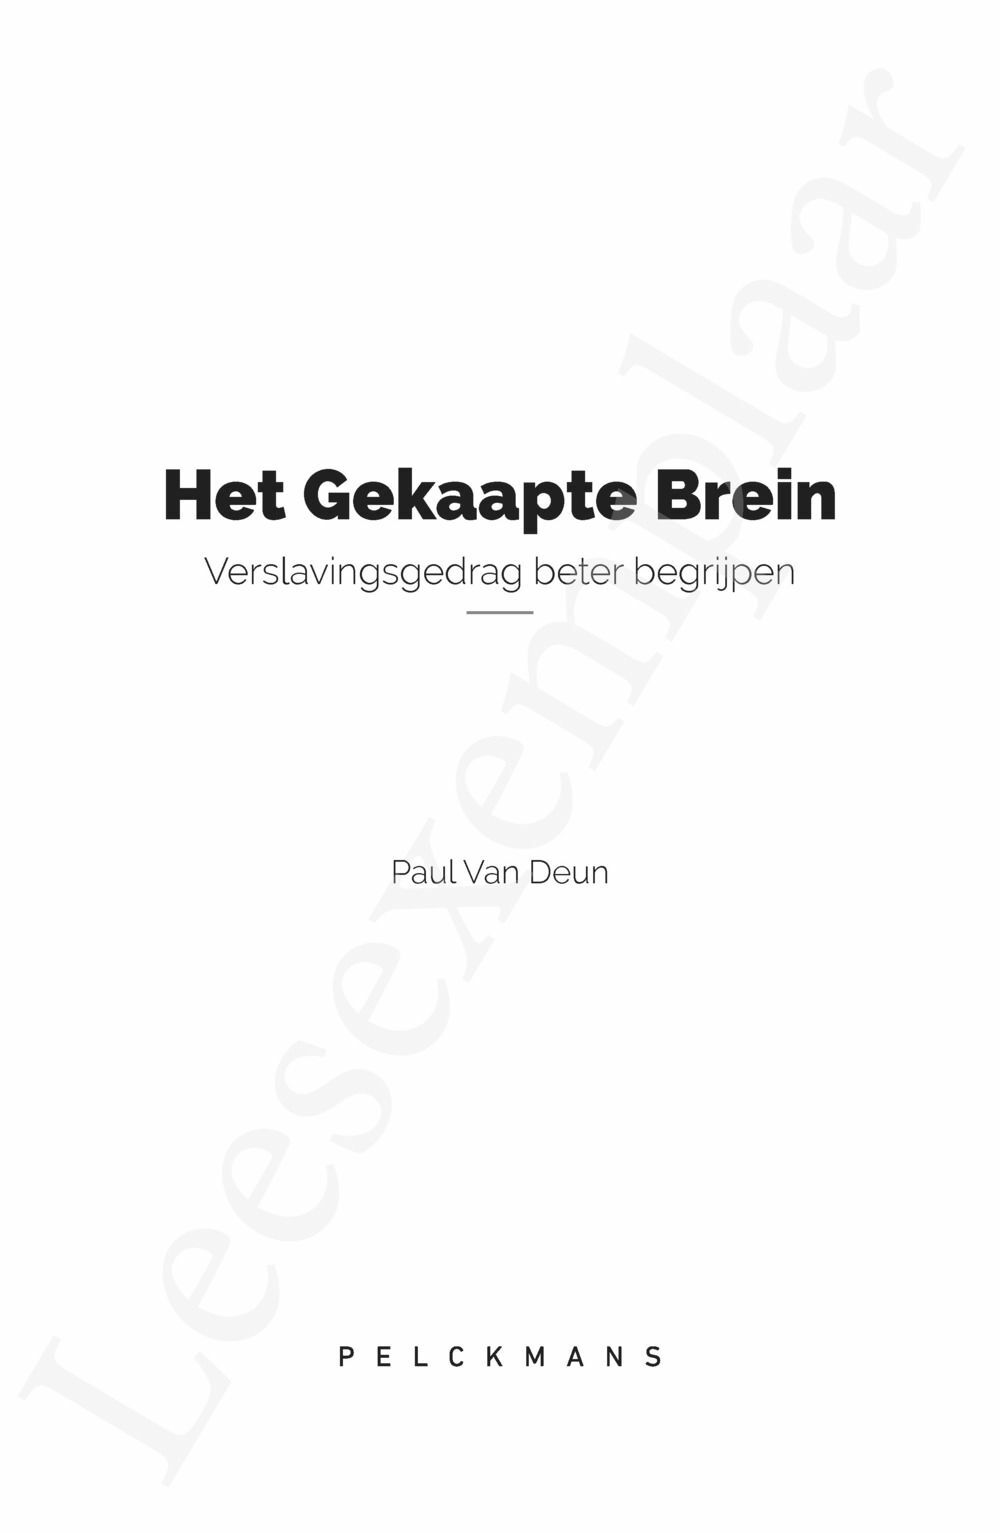 Preview: Het gekaapte brein